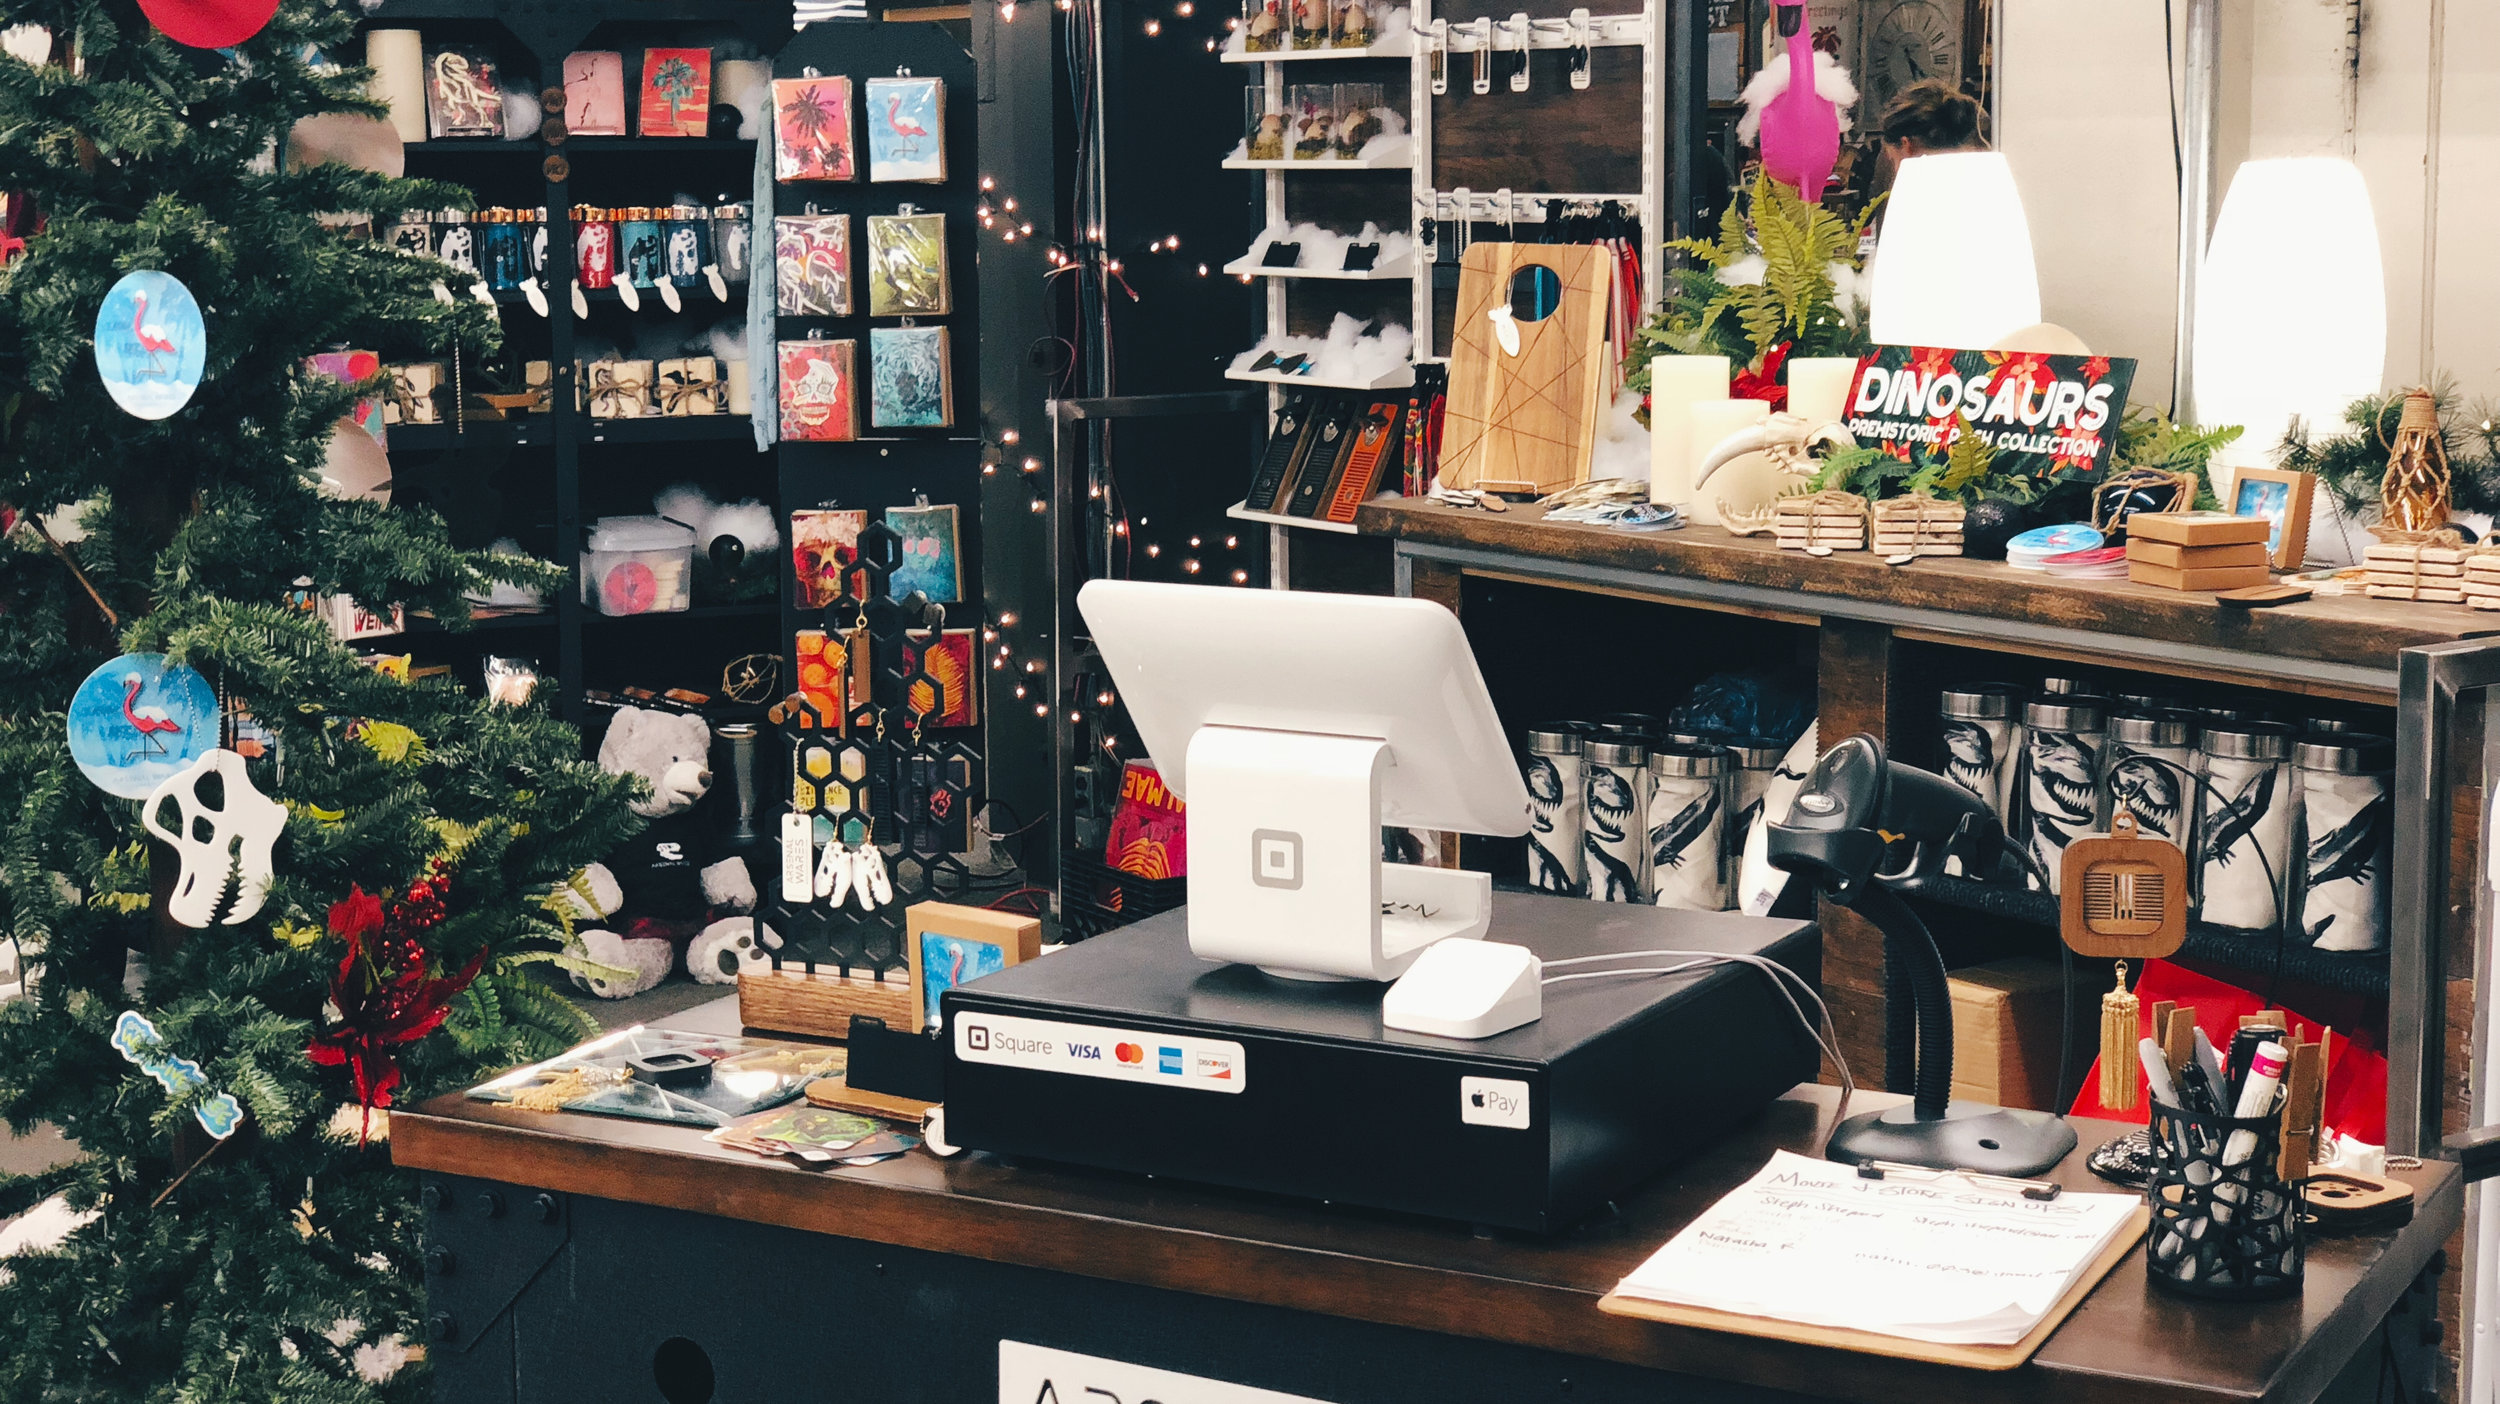 Arsenal Wares Pop Up Shop at the Denver Flea (Blake Shattuck, Savage Queen LLC)